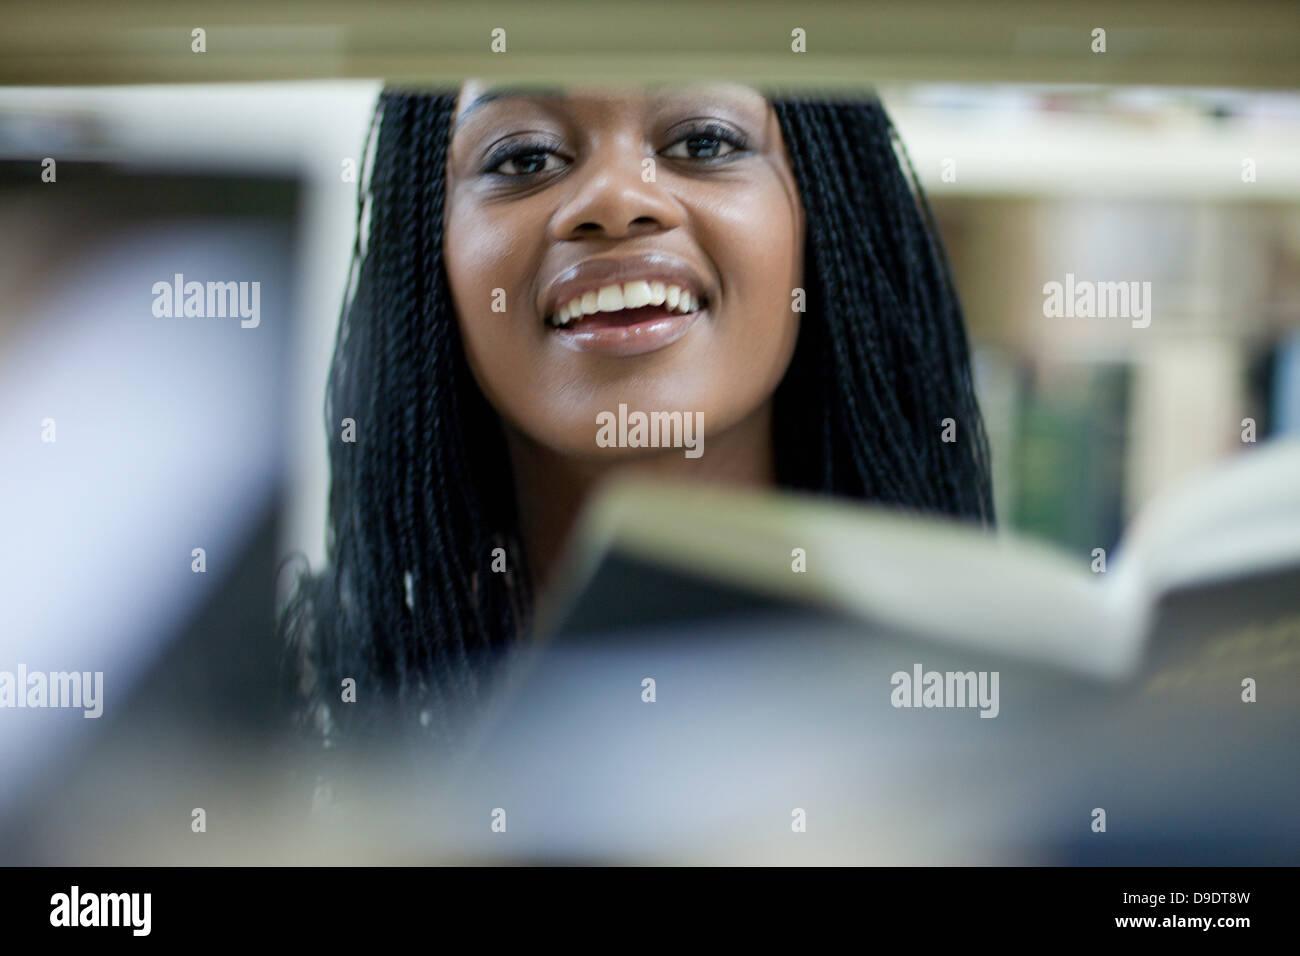 Female student peering between books - Stock Image